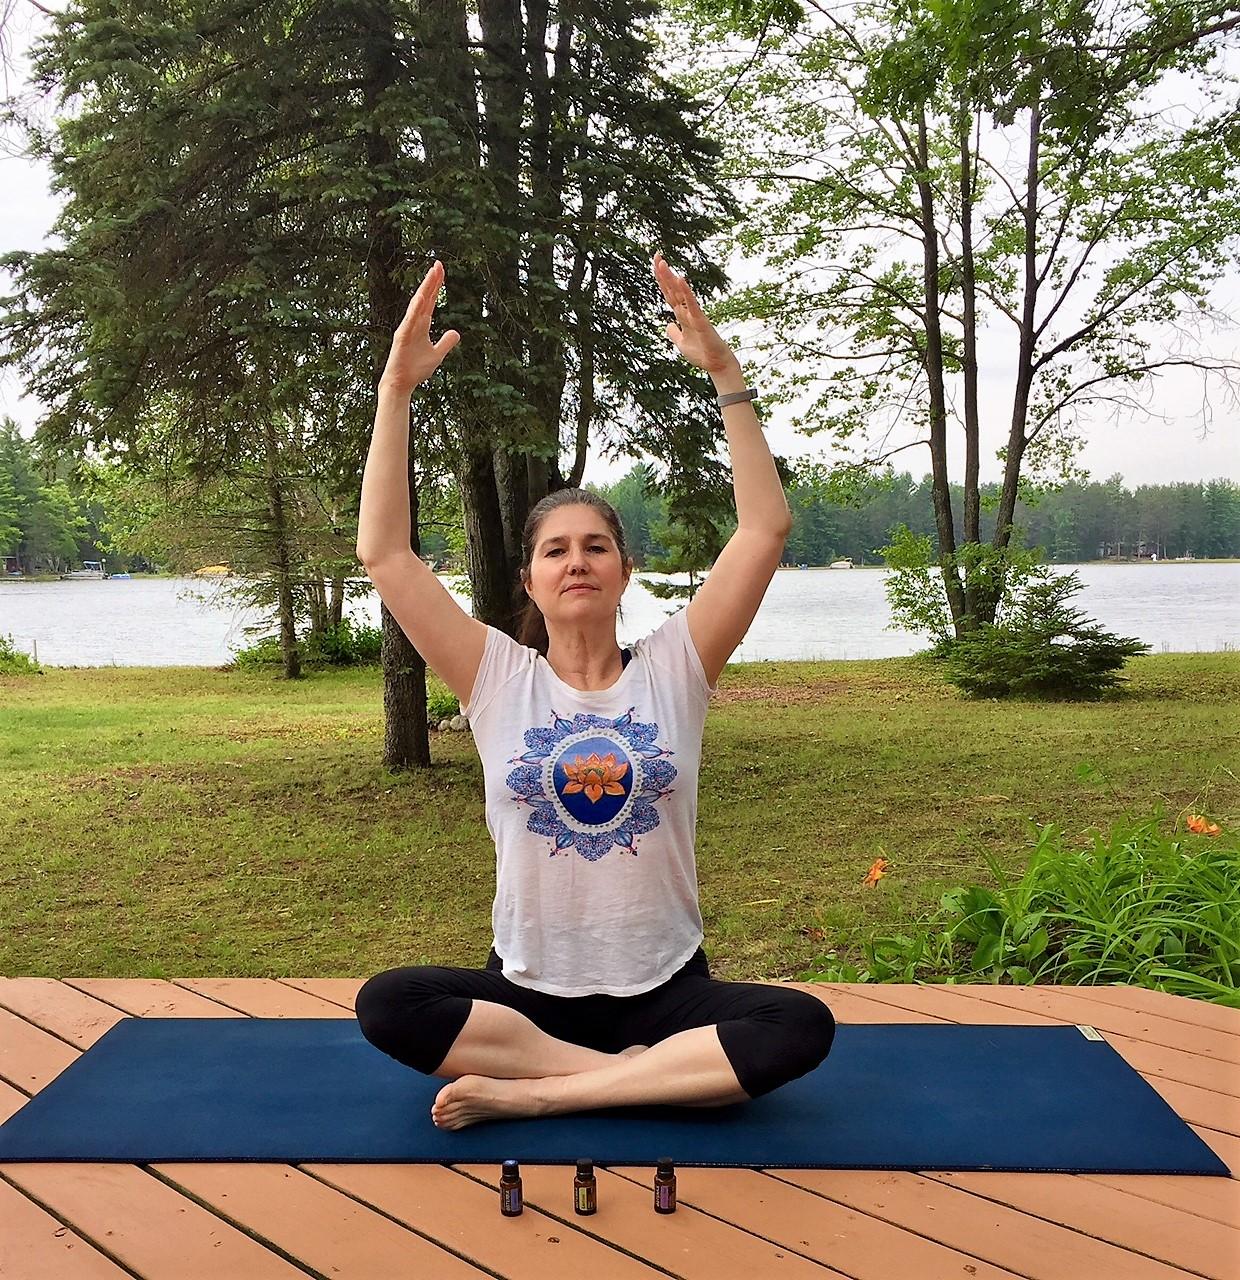 Yoga Videos Archives - Next Level Yoga